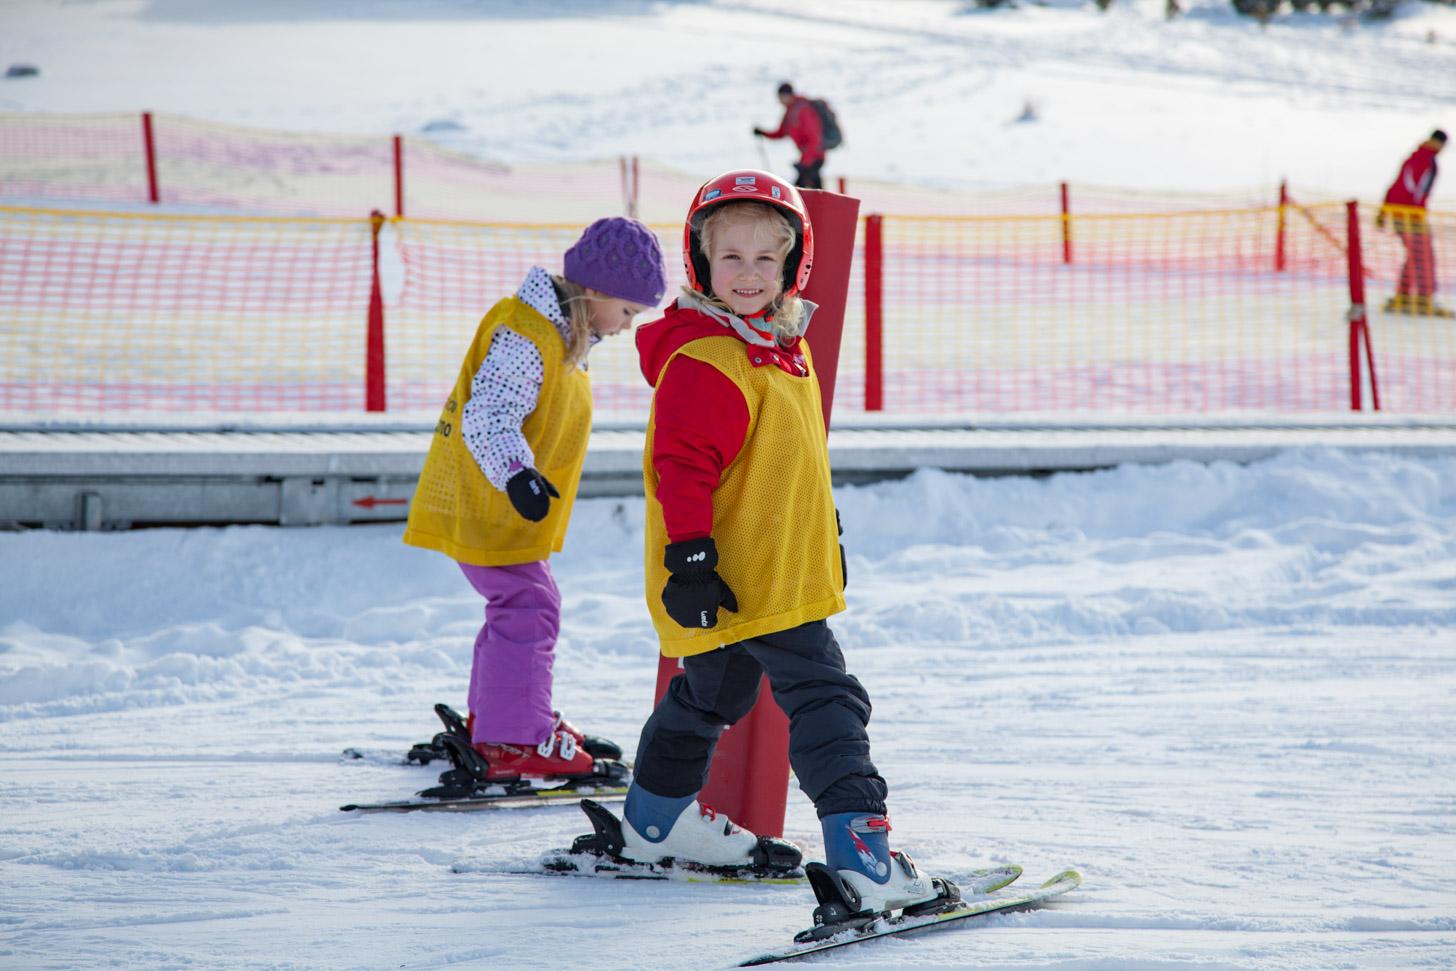 Een beginnende skiër